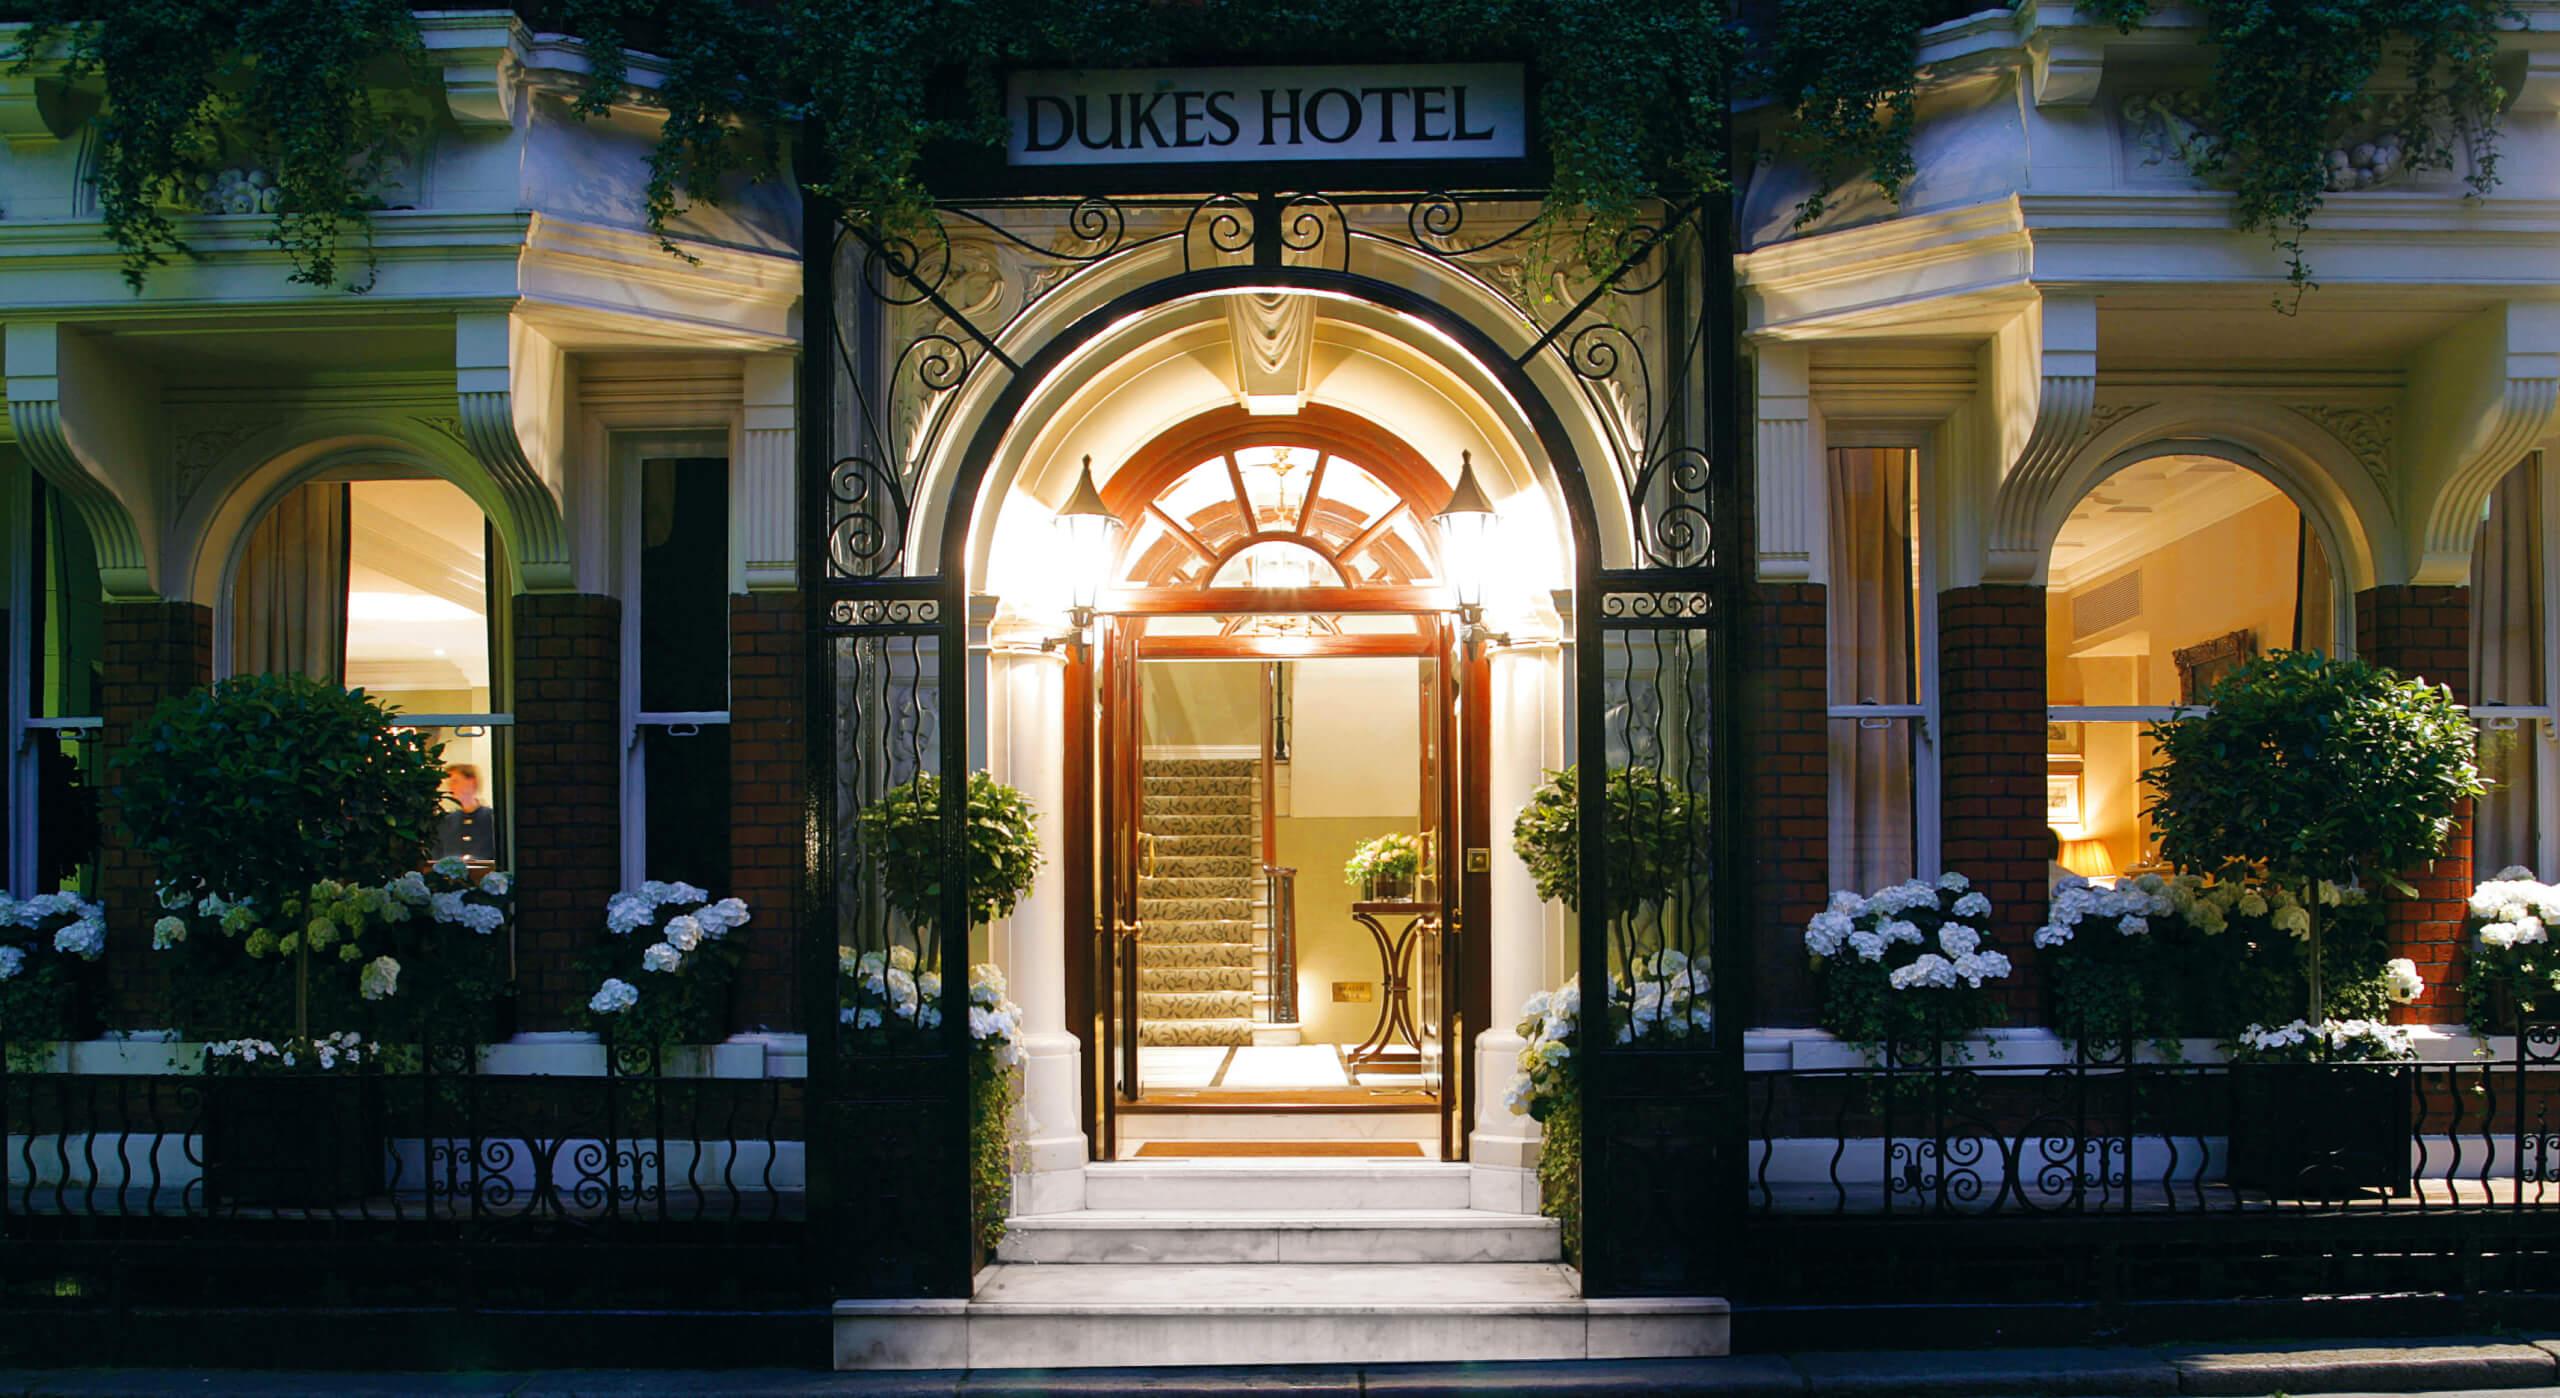 dukes hotel london, bloomsbury hotel london, boutique hotels london, best hotels in london, bloomsbury hotel, where to stay in london, Dukes Hotel, dukes hotel mayfair, hotels in london,